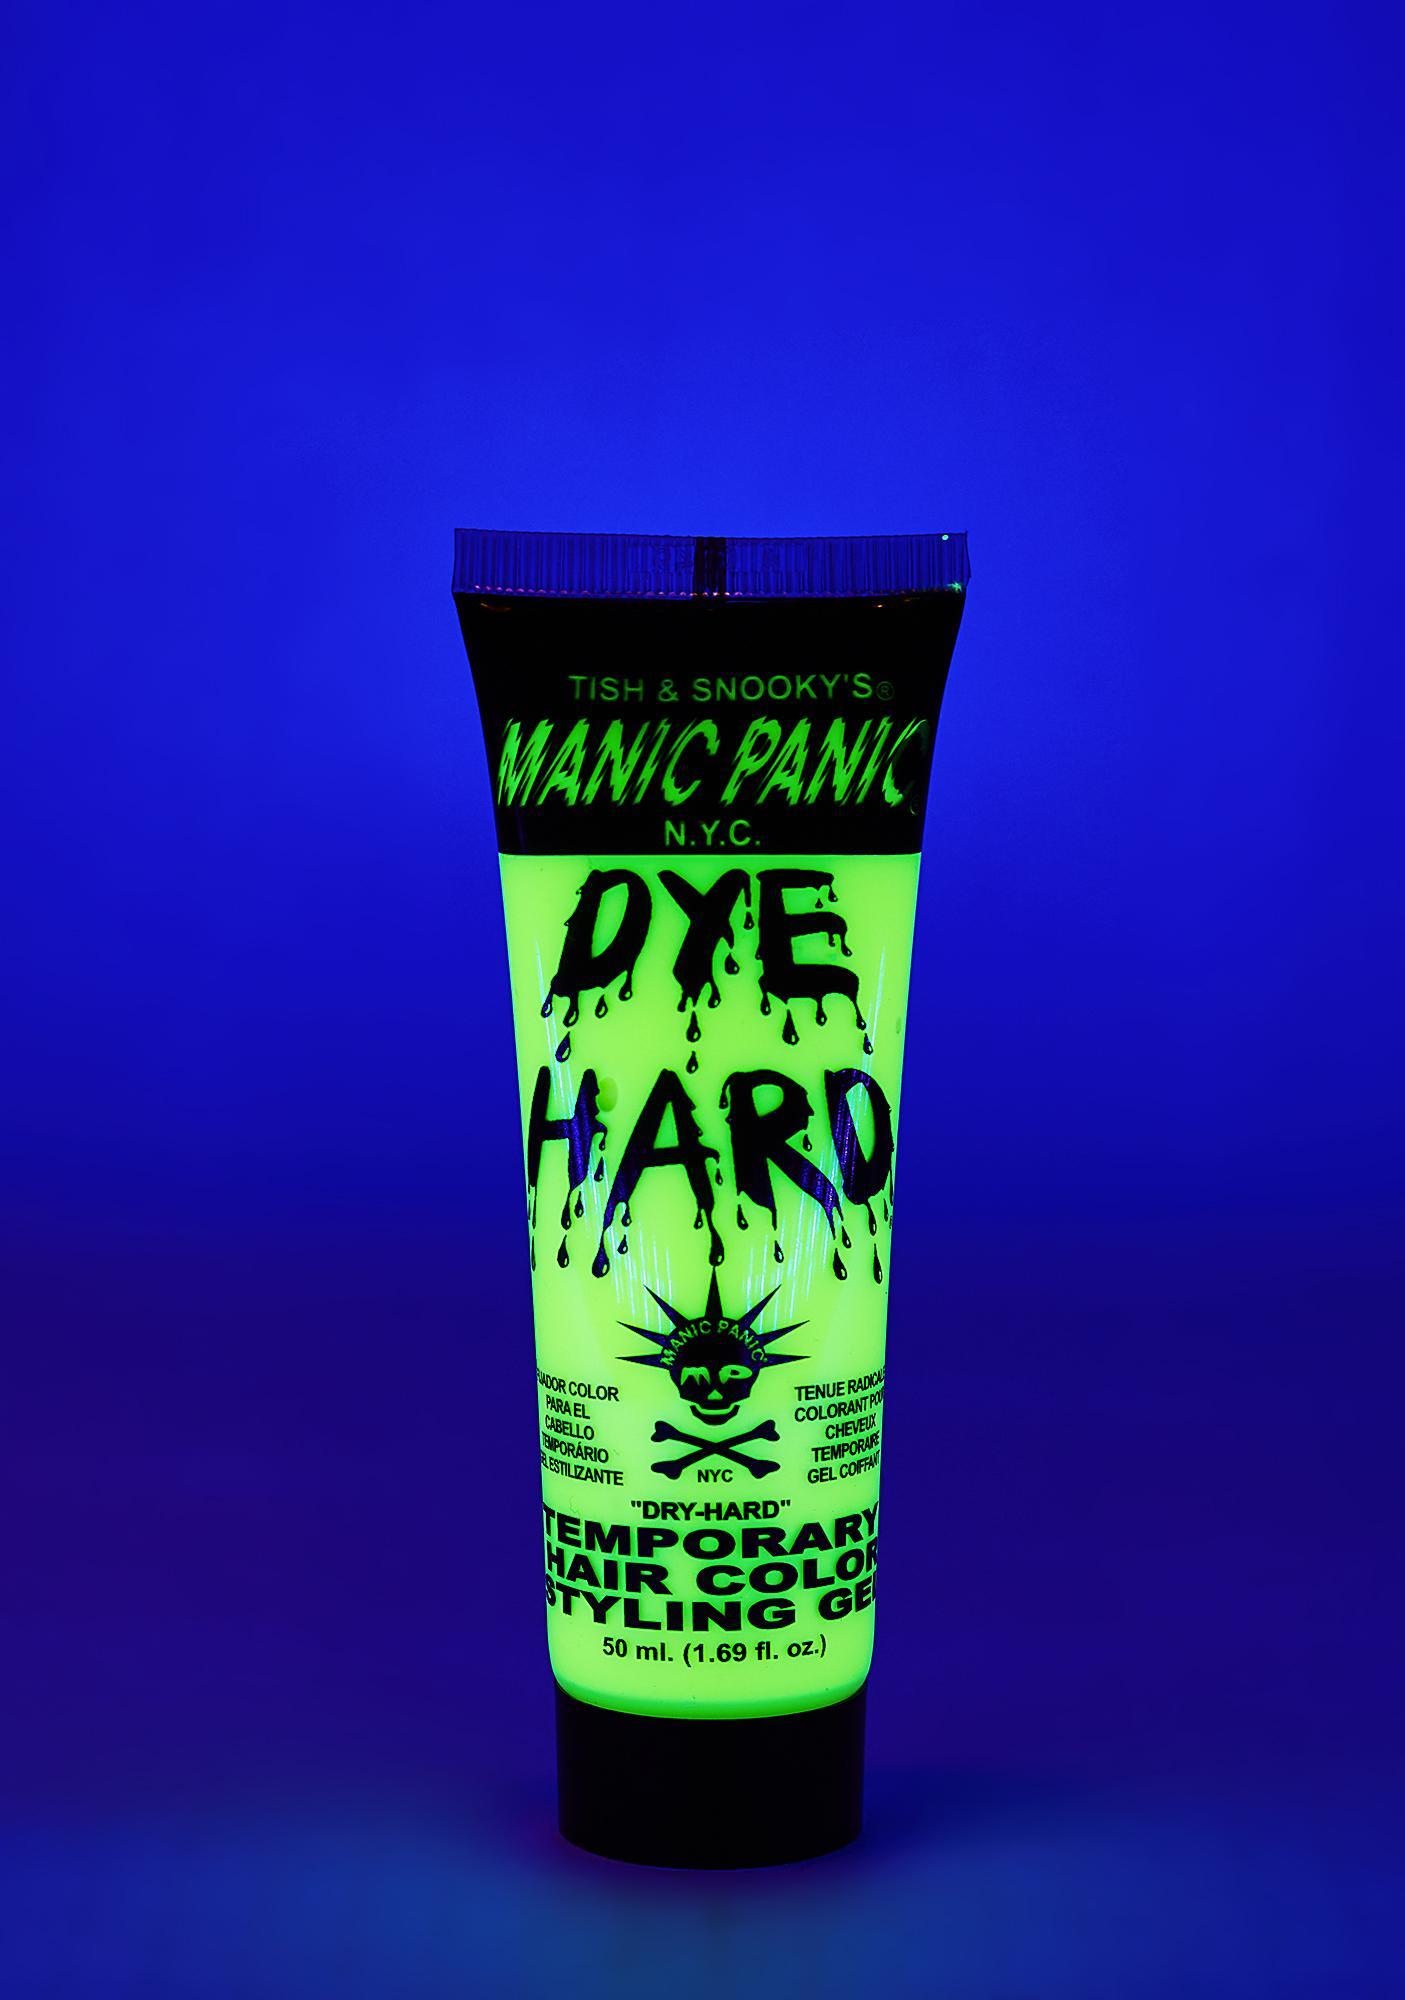 Manic Panic Electric Banana Dye Hard Styling Gel